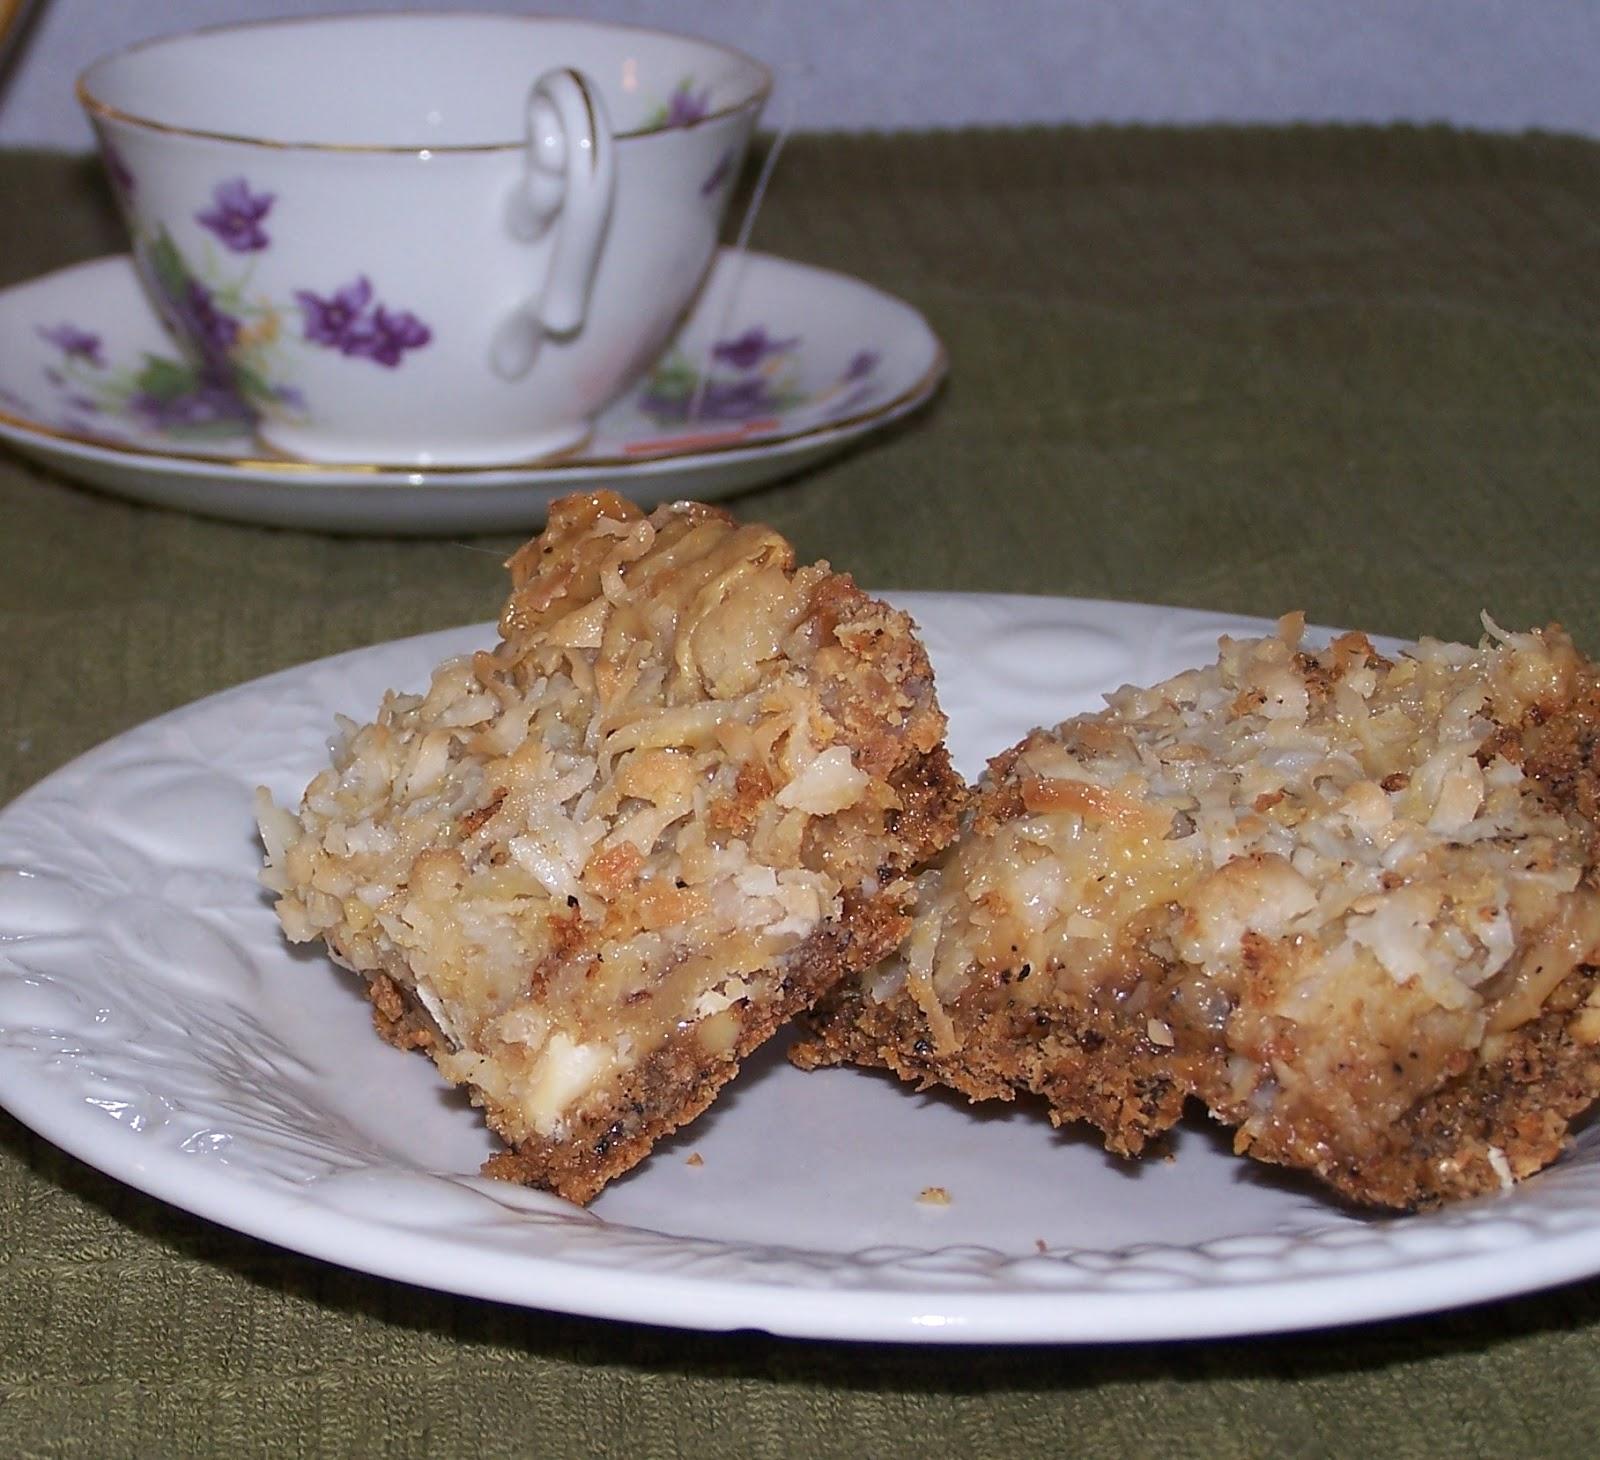 Almond Meal Gluten Free Chocolate Cake